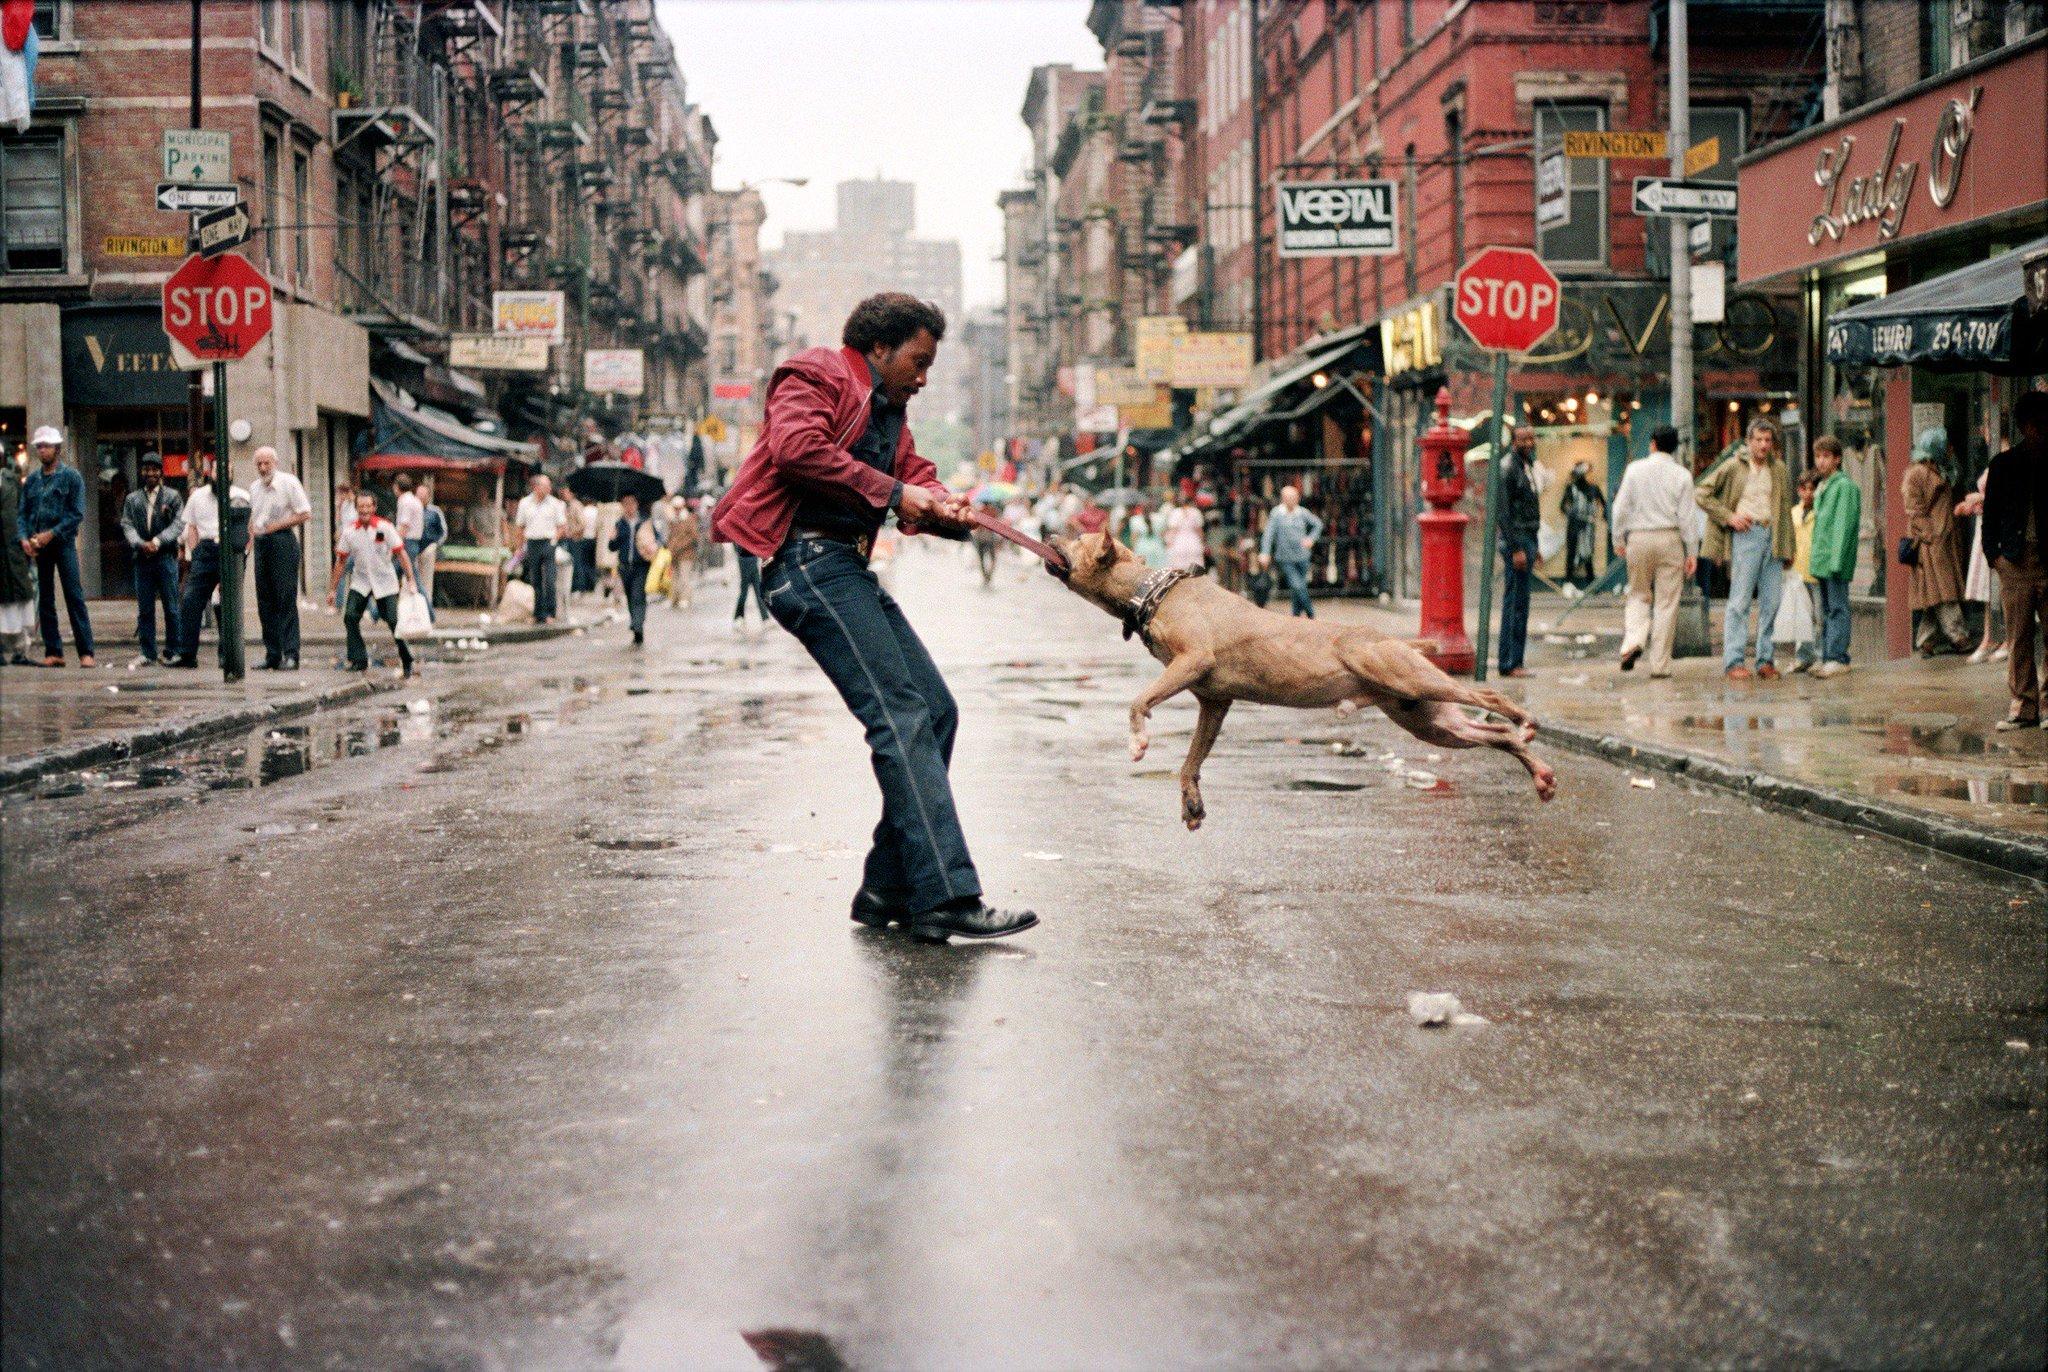 Street Photography,Man and Dog, 1980, New York, Jamel Shabazz Cheryl Dunn Everybody Street